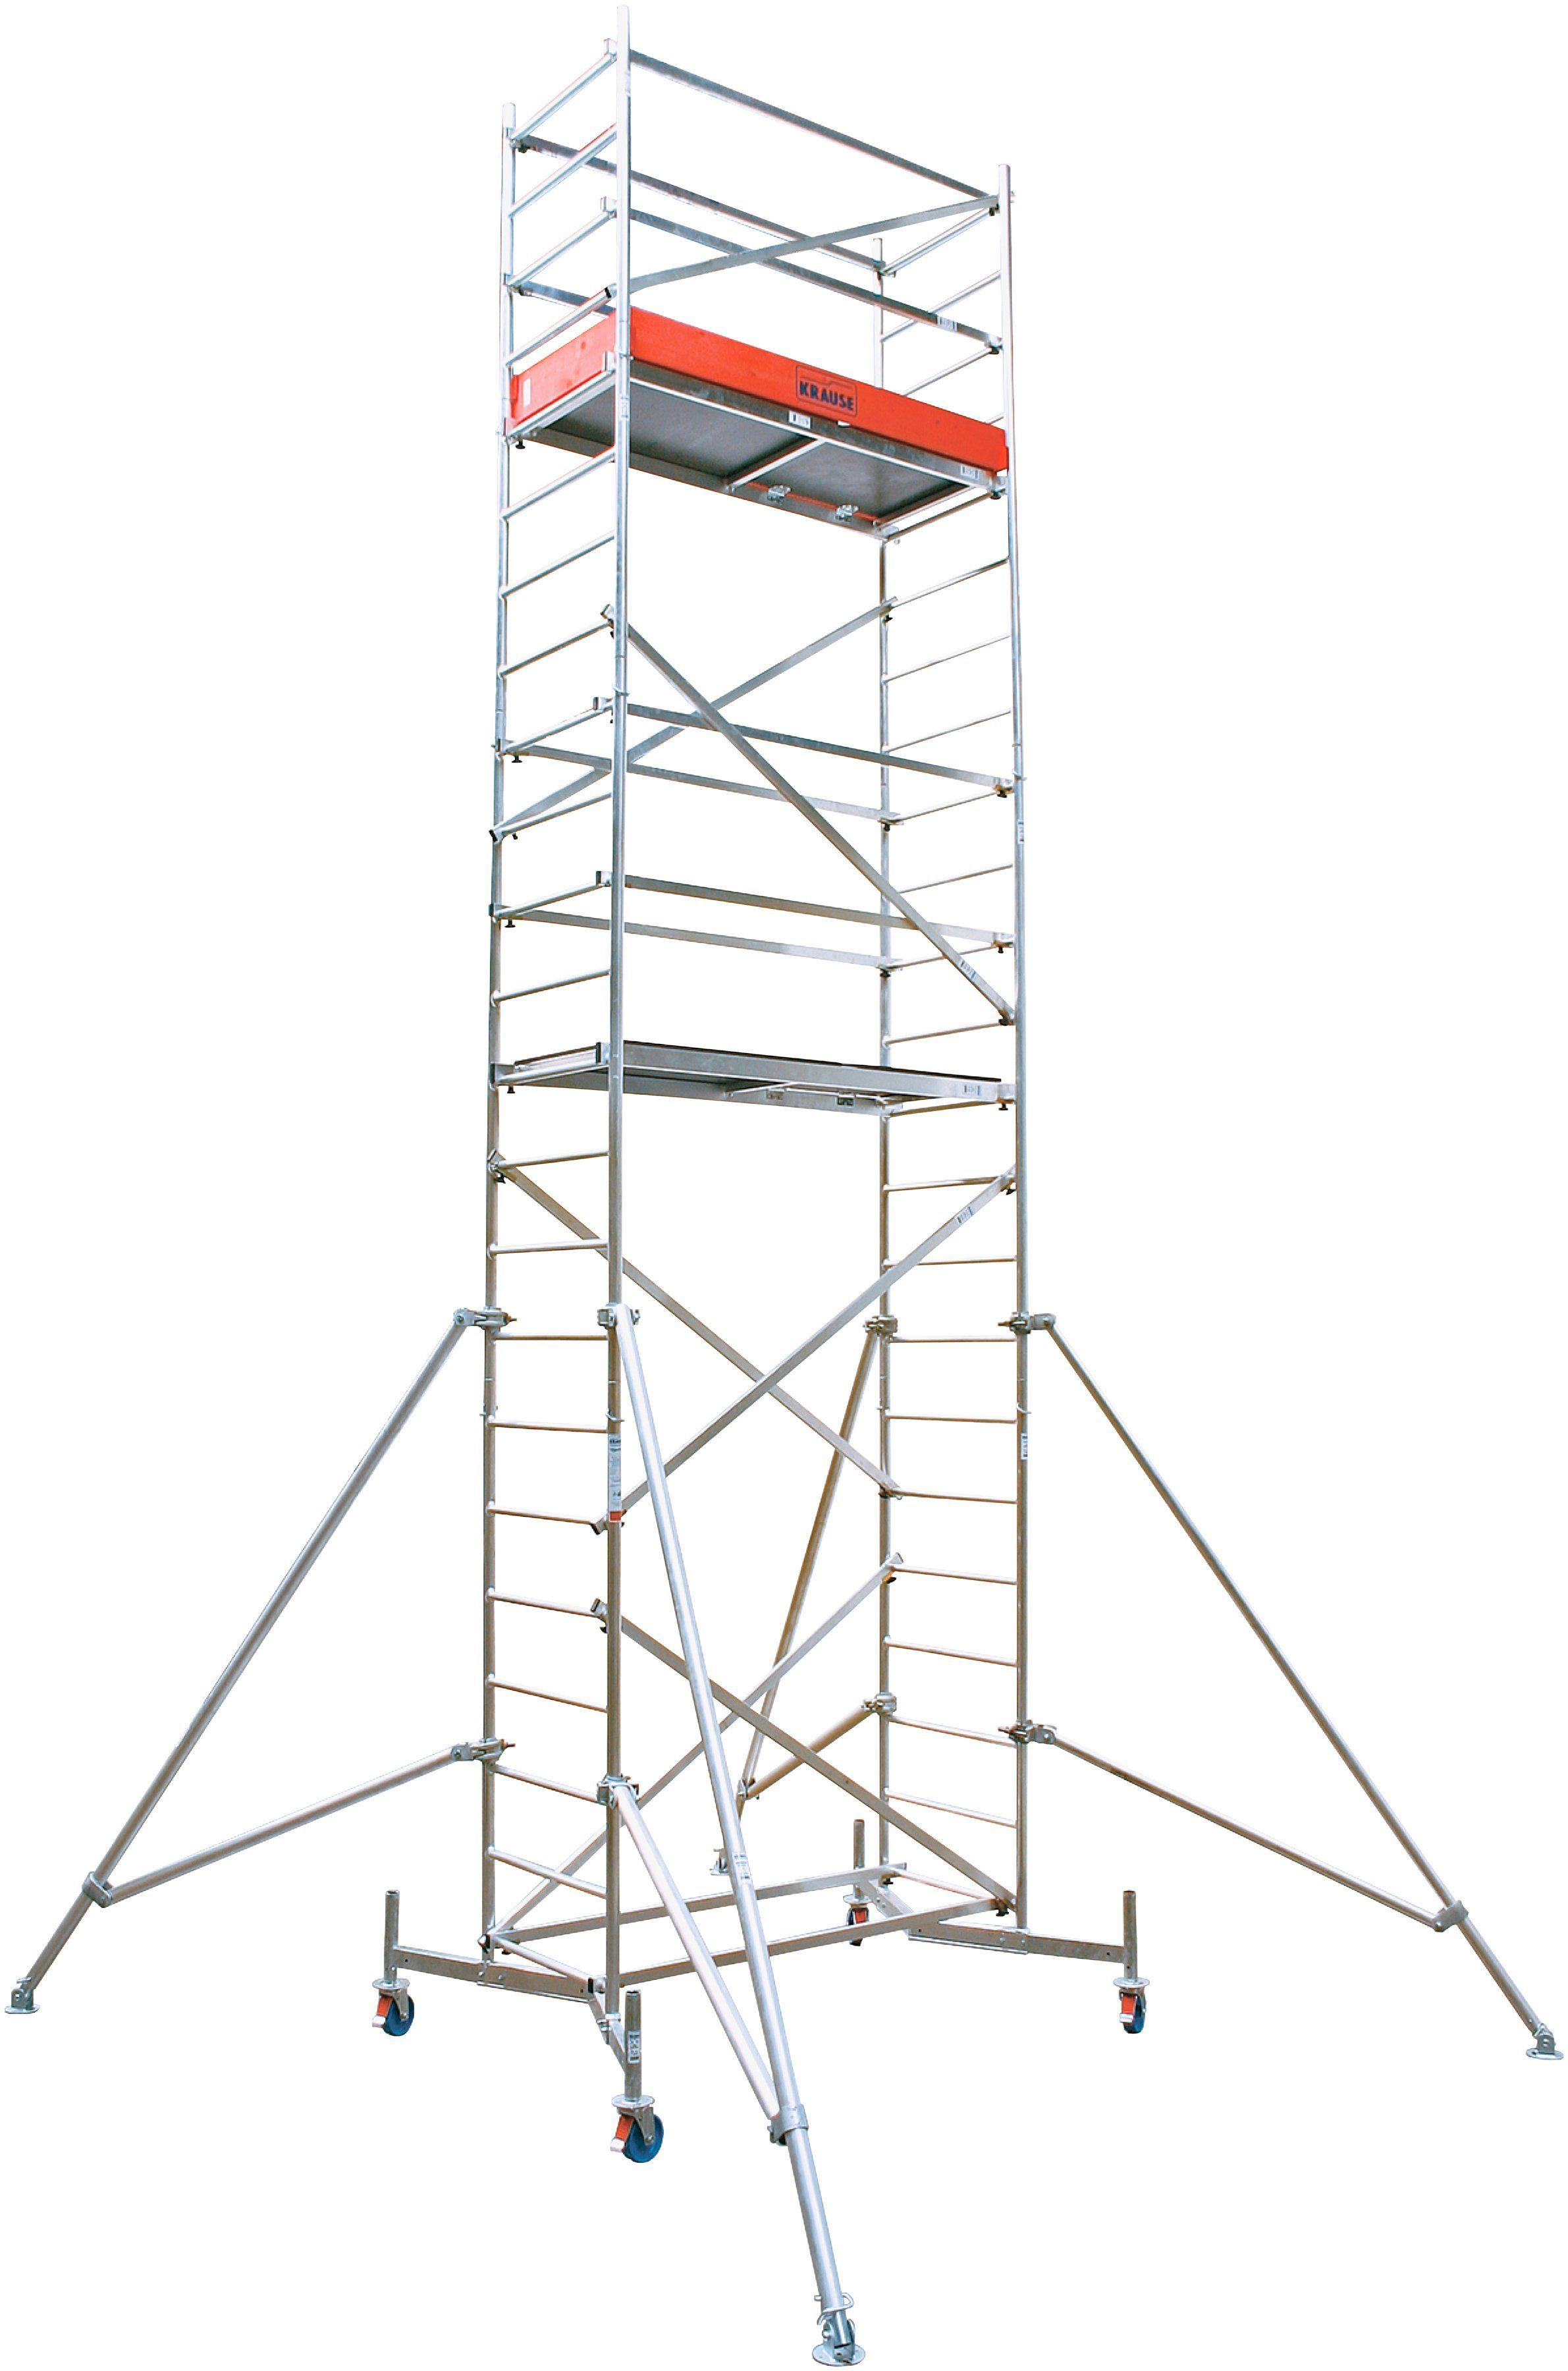 KRAUSE Fahrgerüst »ClimTec«, Arbeitshöhe 7 m, inkl. Fahrrollensatz Ø 150 mm